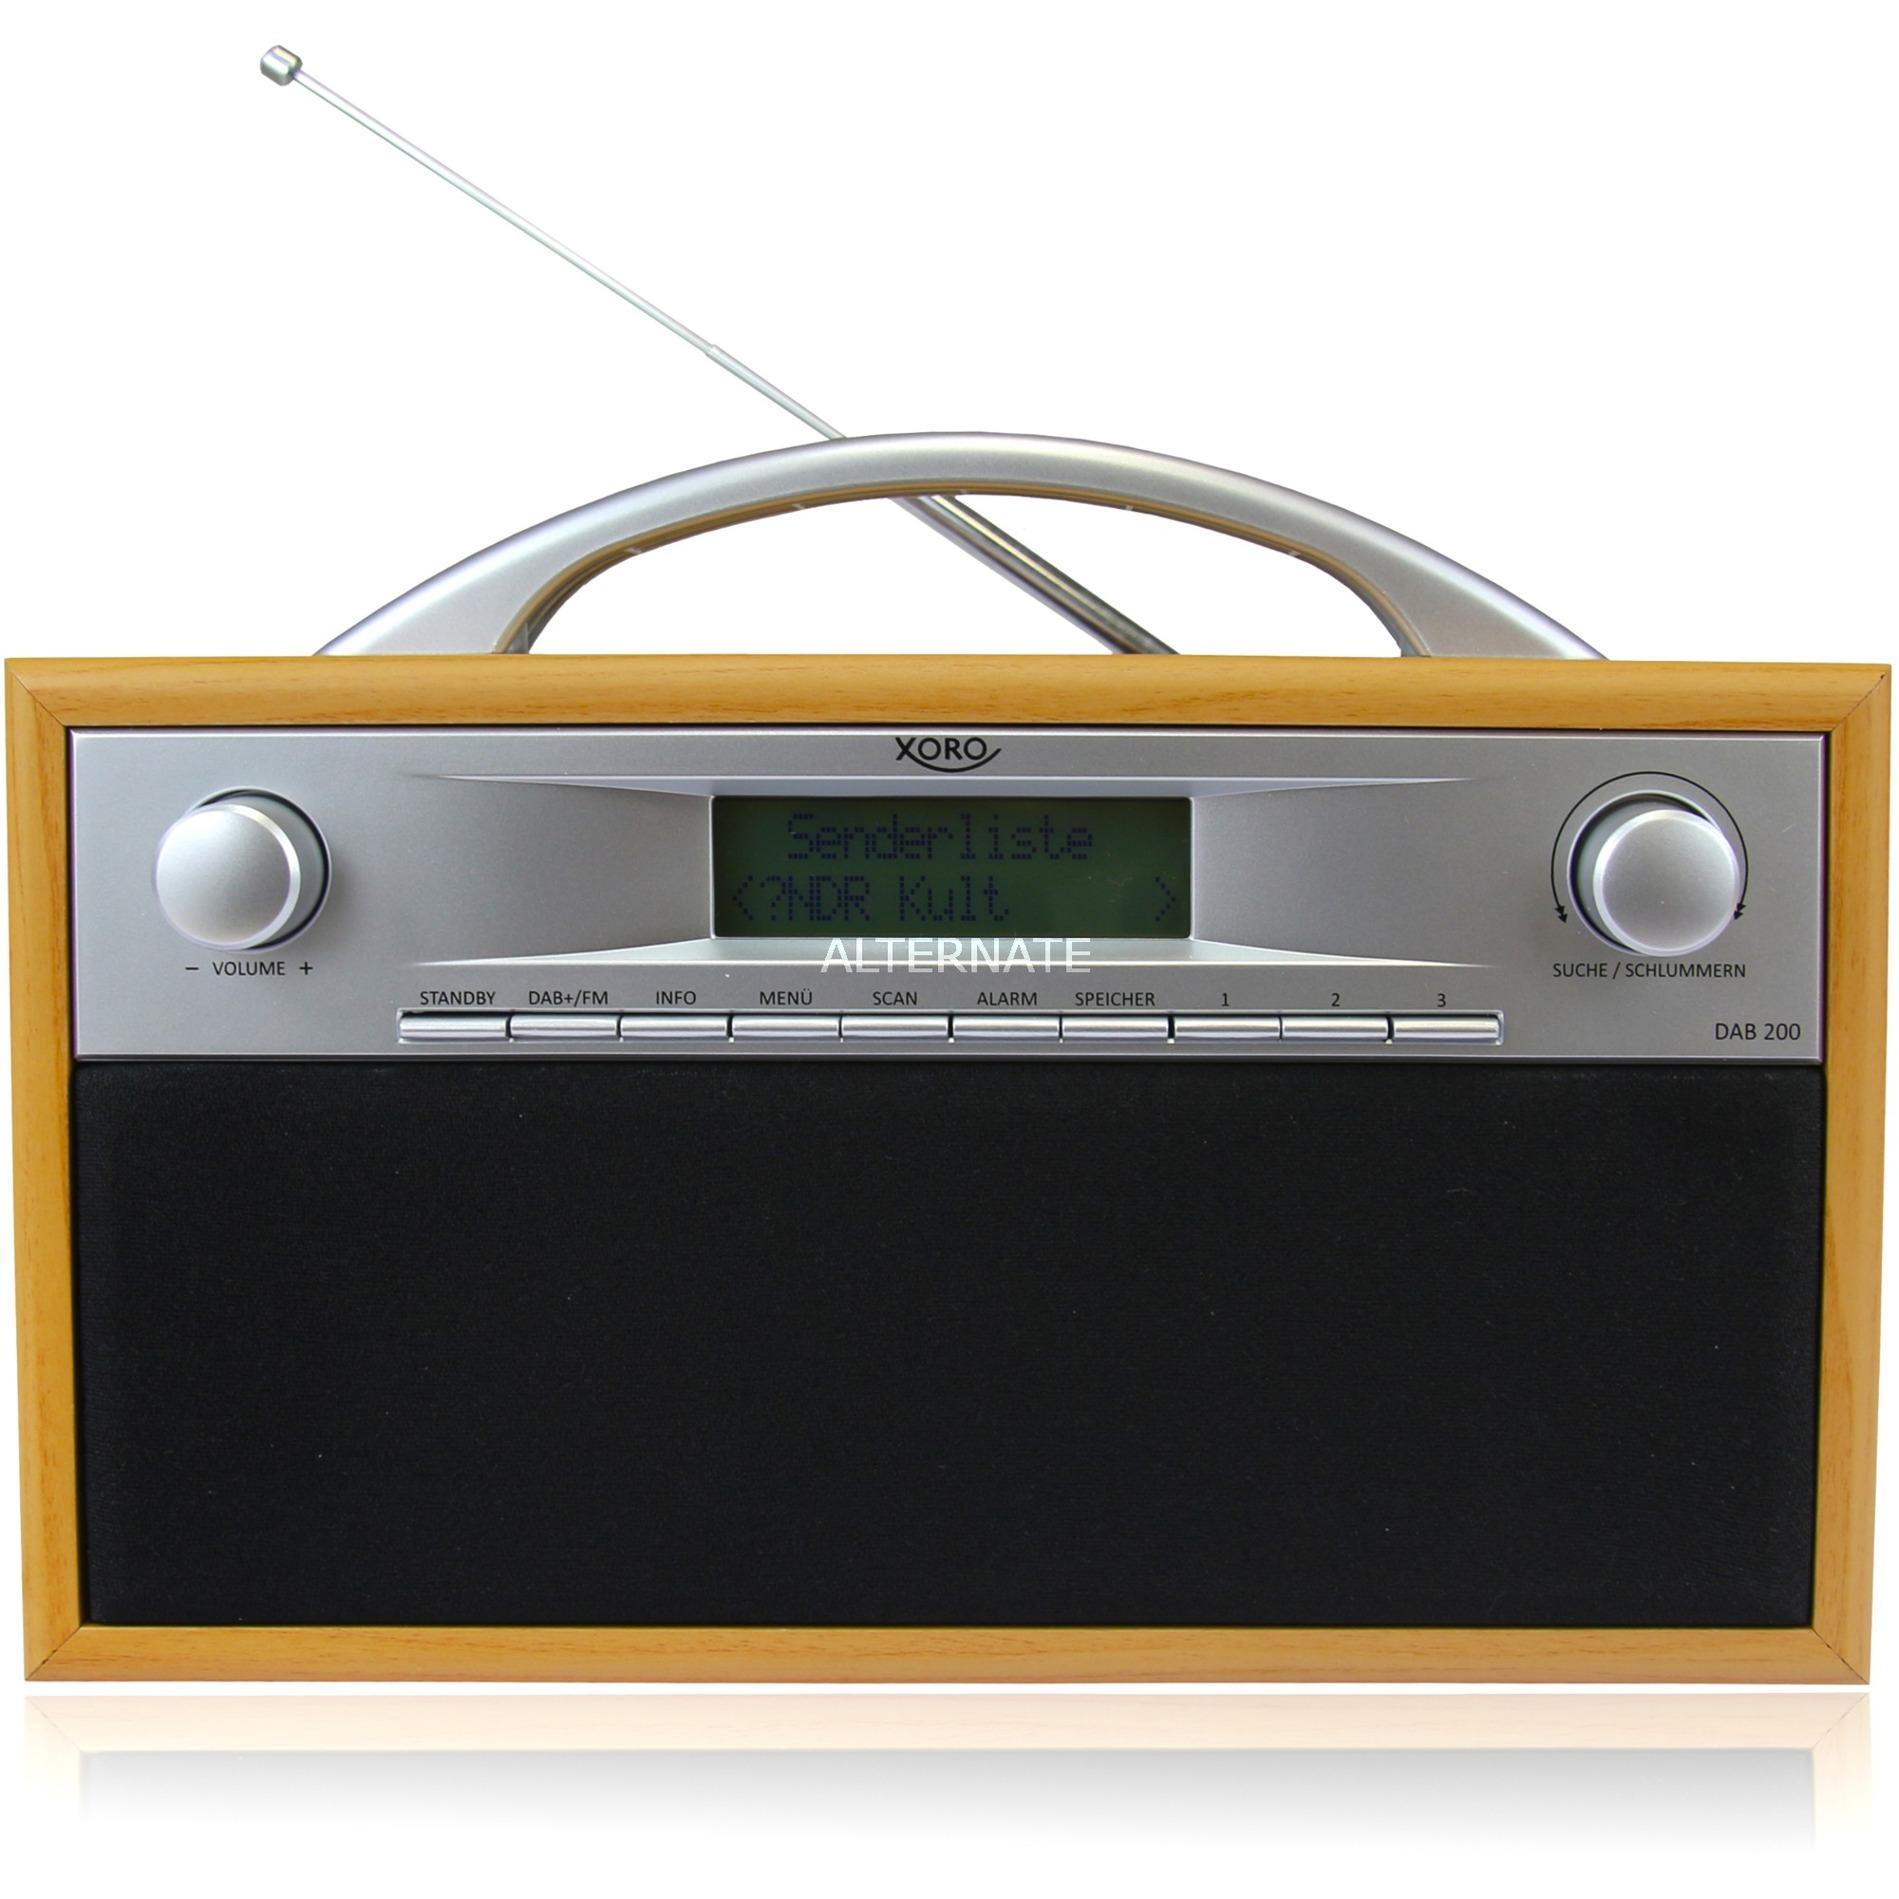 DAB 200 radio Portátil Digital Negro, Gris, Madera